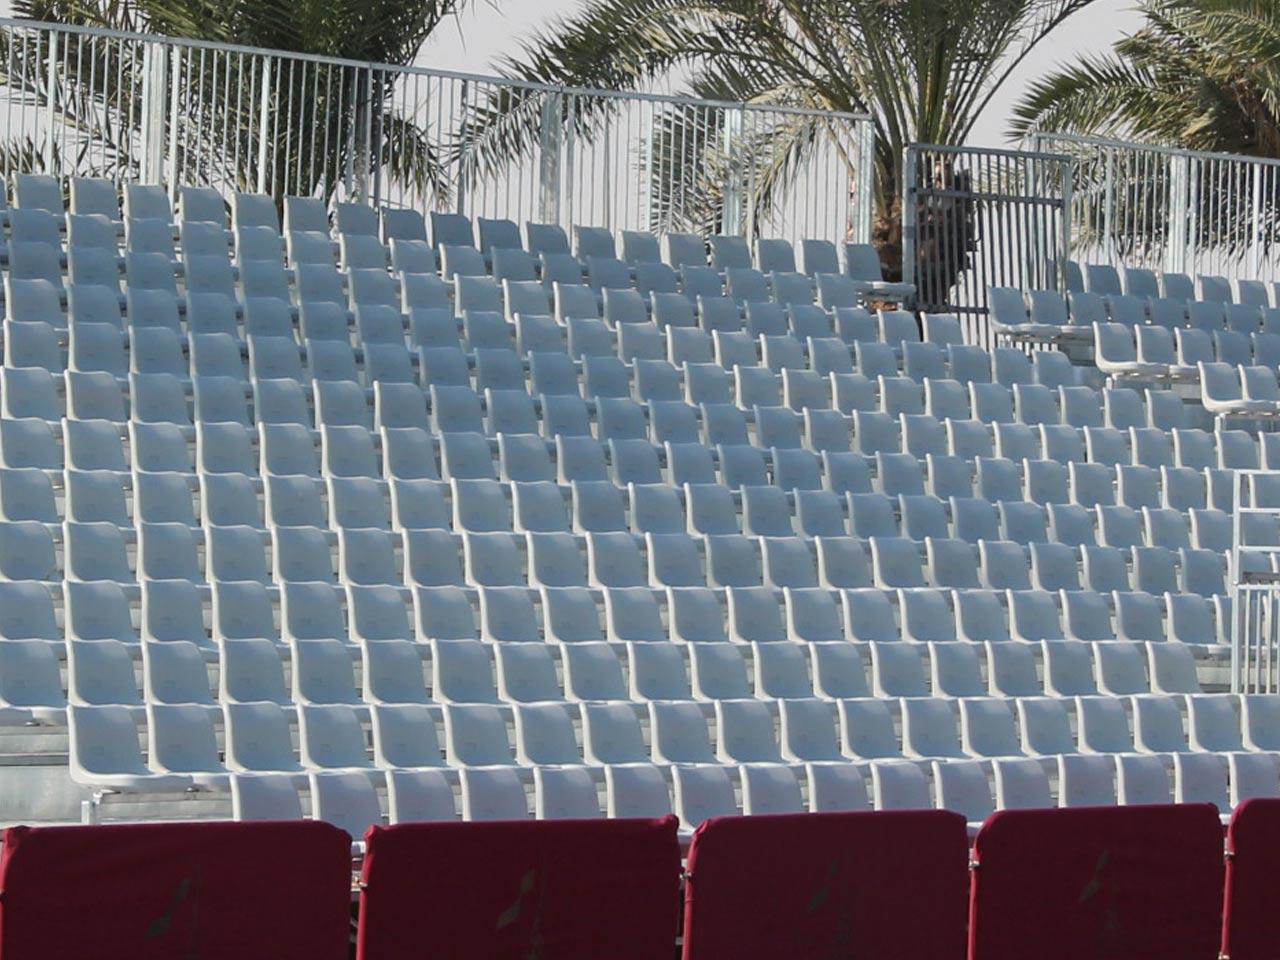 grandstand-seats-events-setup-rental-stadium-seating-sport-management-film-festival-seating-screening-f1-open-air-cinema-5